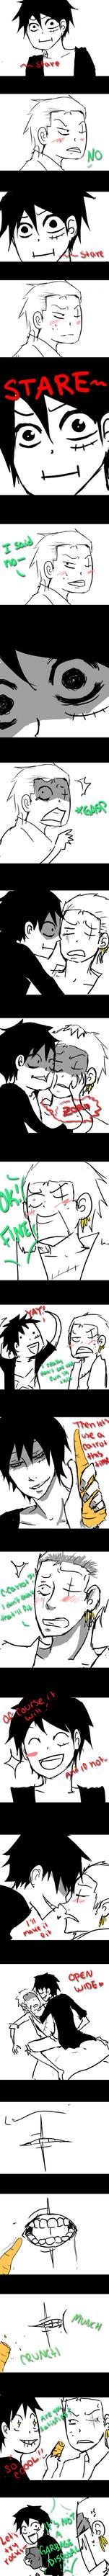 Luffy's Persuasion Method by Minuu-chan